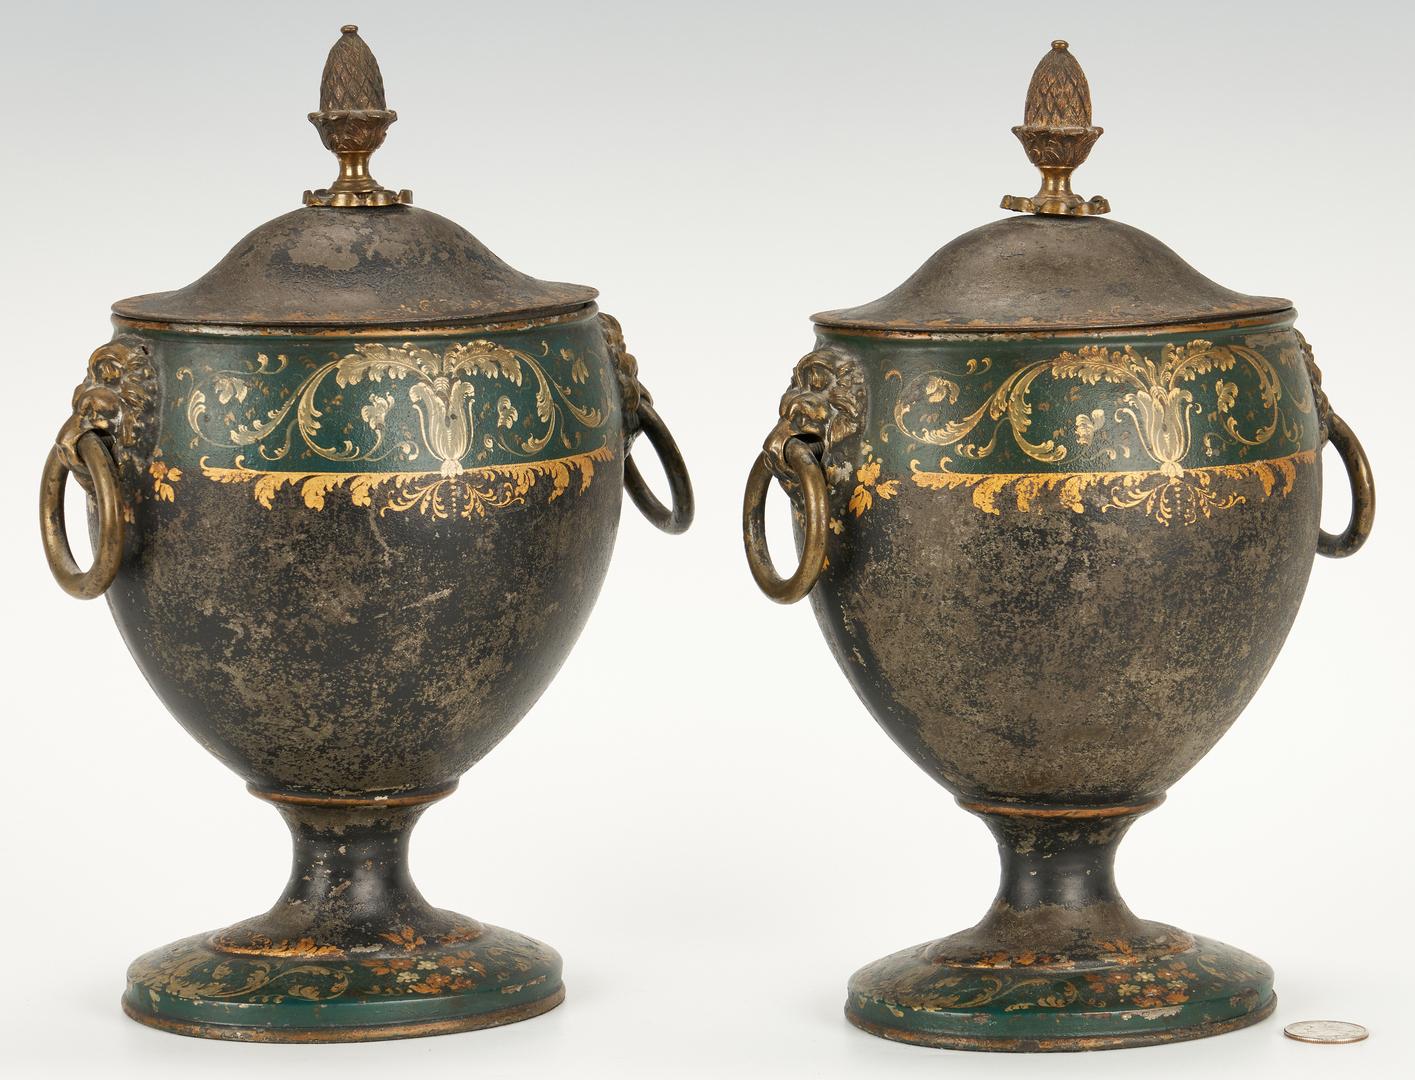 Lot 95: Pair Regency Tole Chestnut Urns